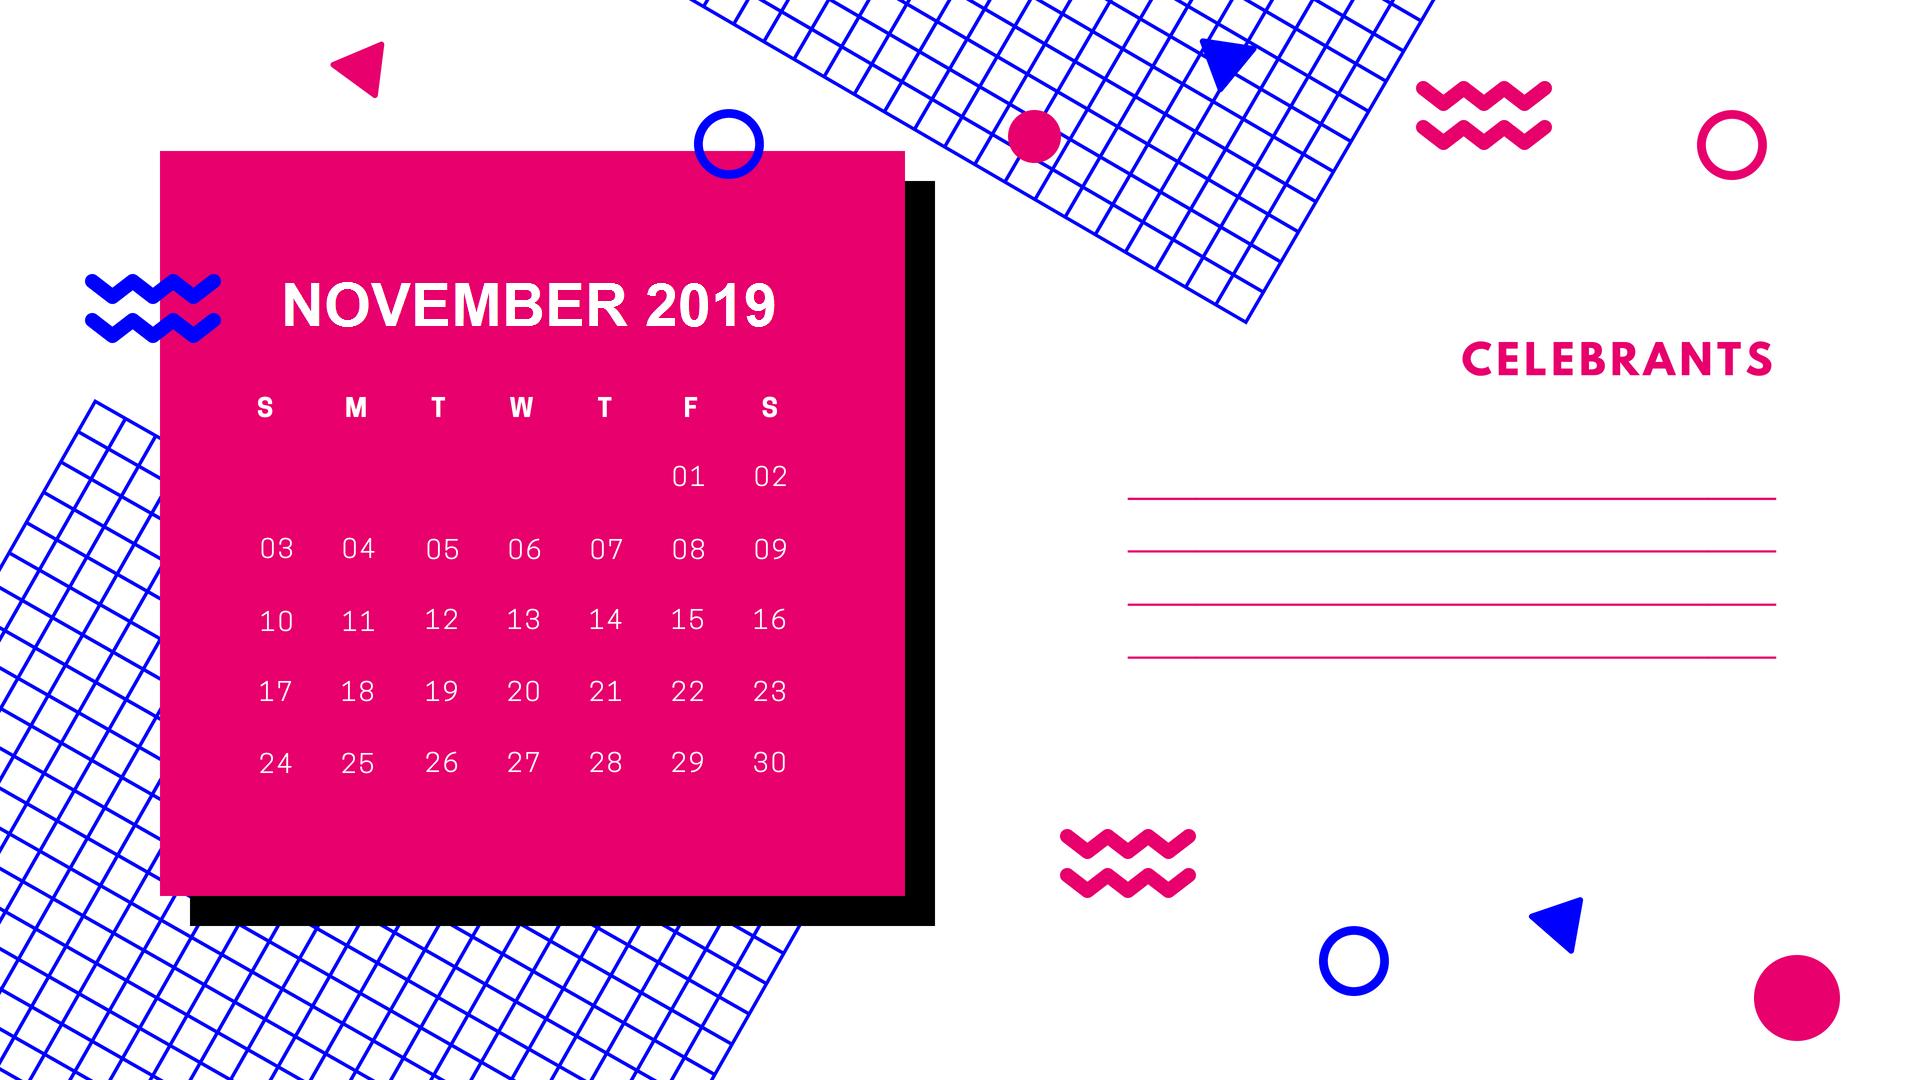 Cute November 2019 Calendar Template with Notes